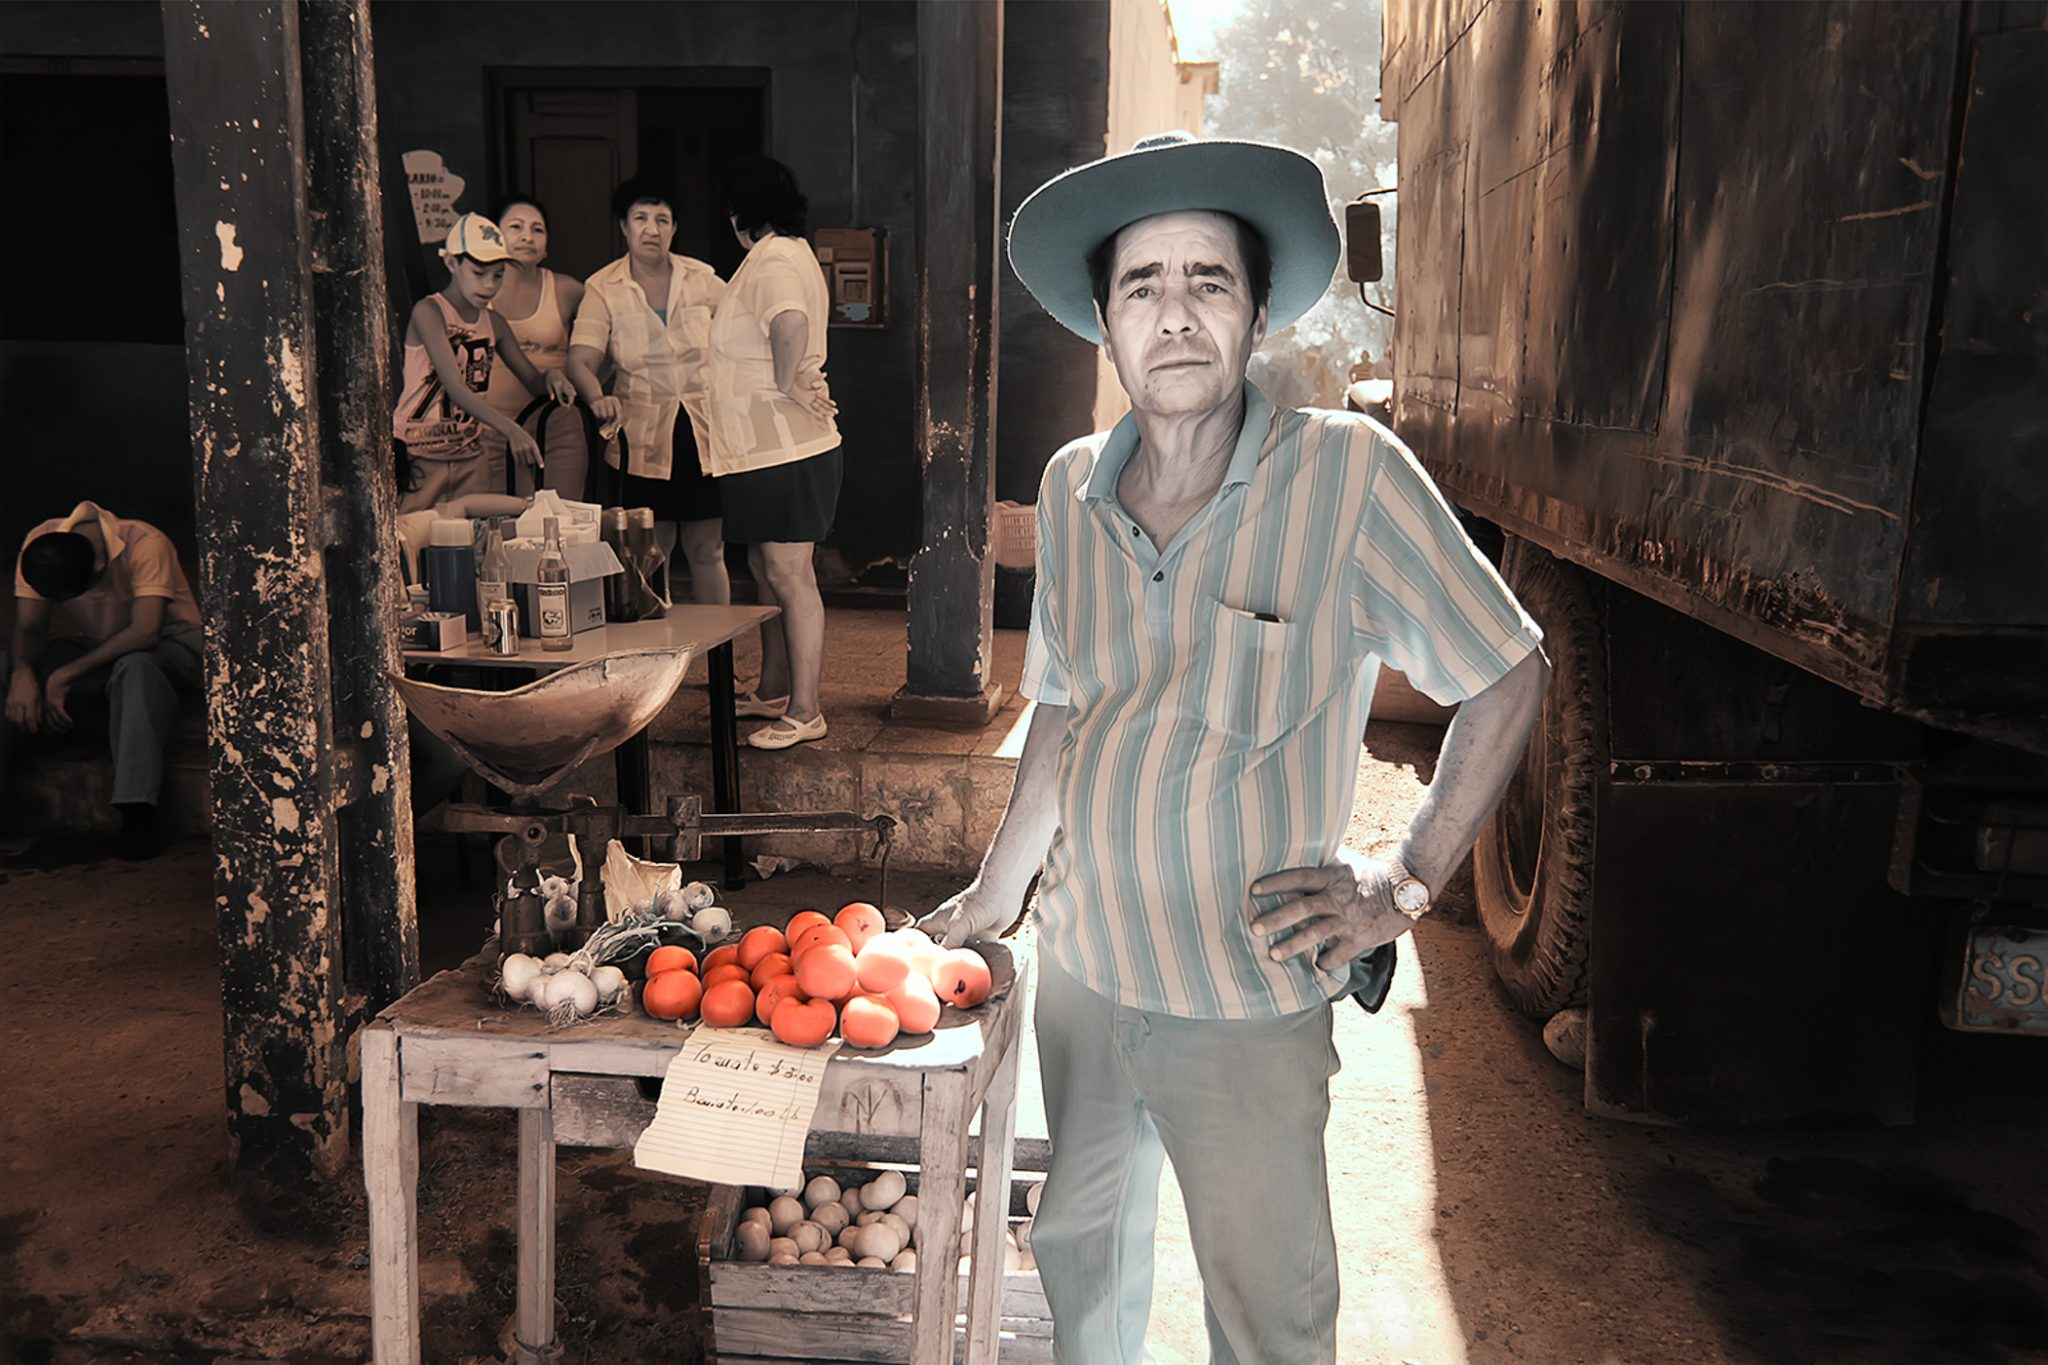 Man Selling Tomato 2/15 © EK Waller